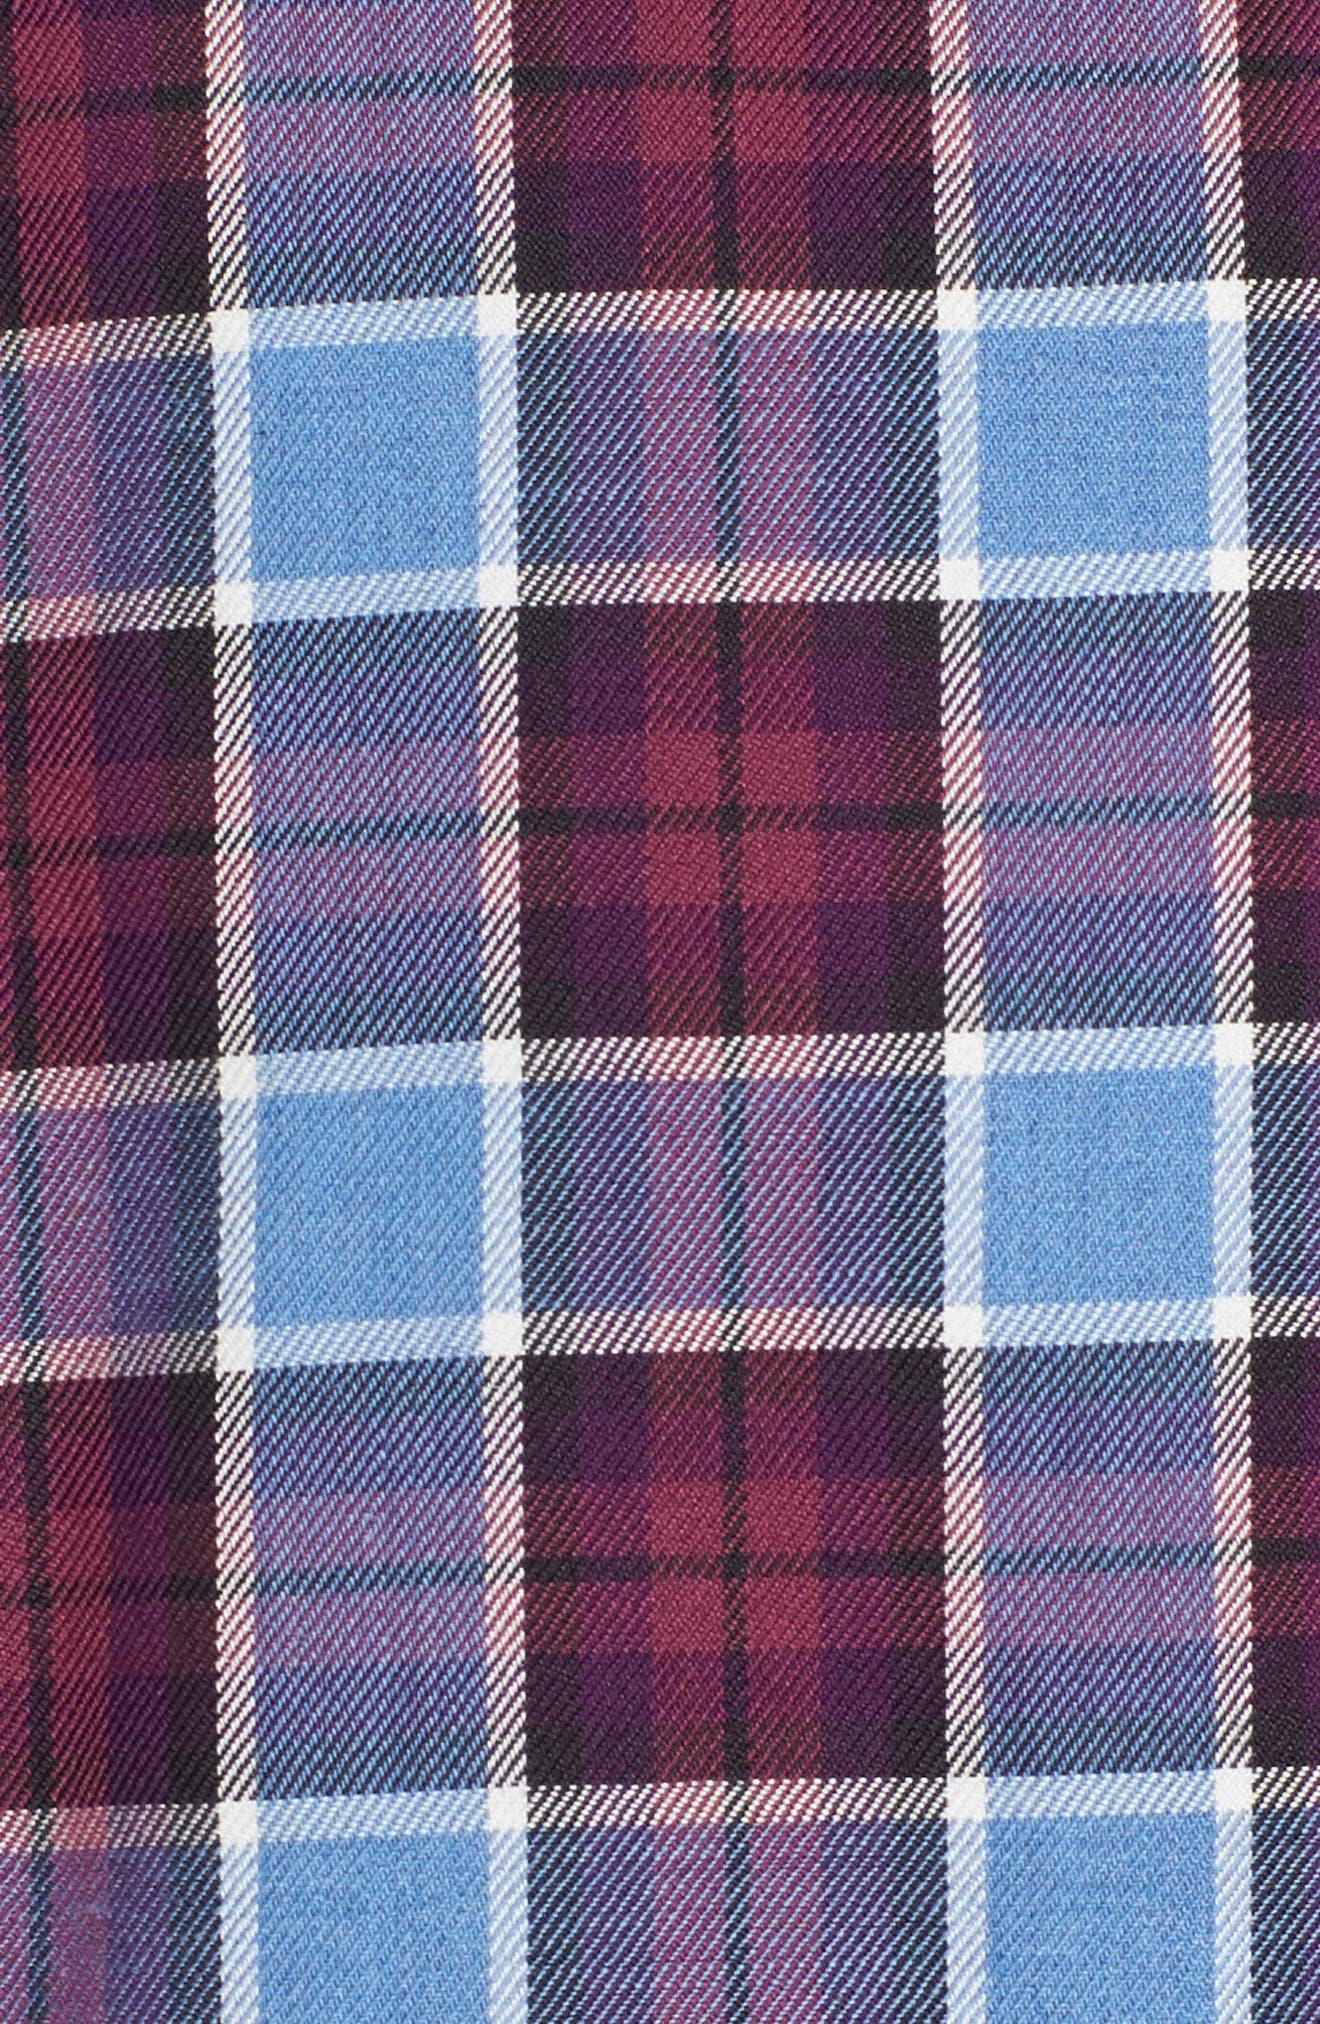 Campti Regular Fit Plaid Sport Shirt,                             Alternate thumbnail 5, color,                             Purple